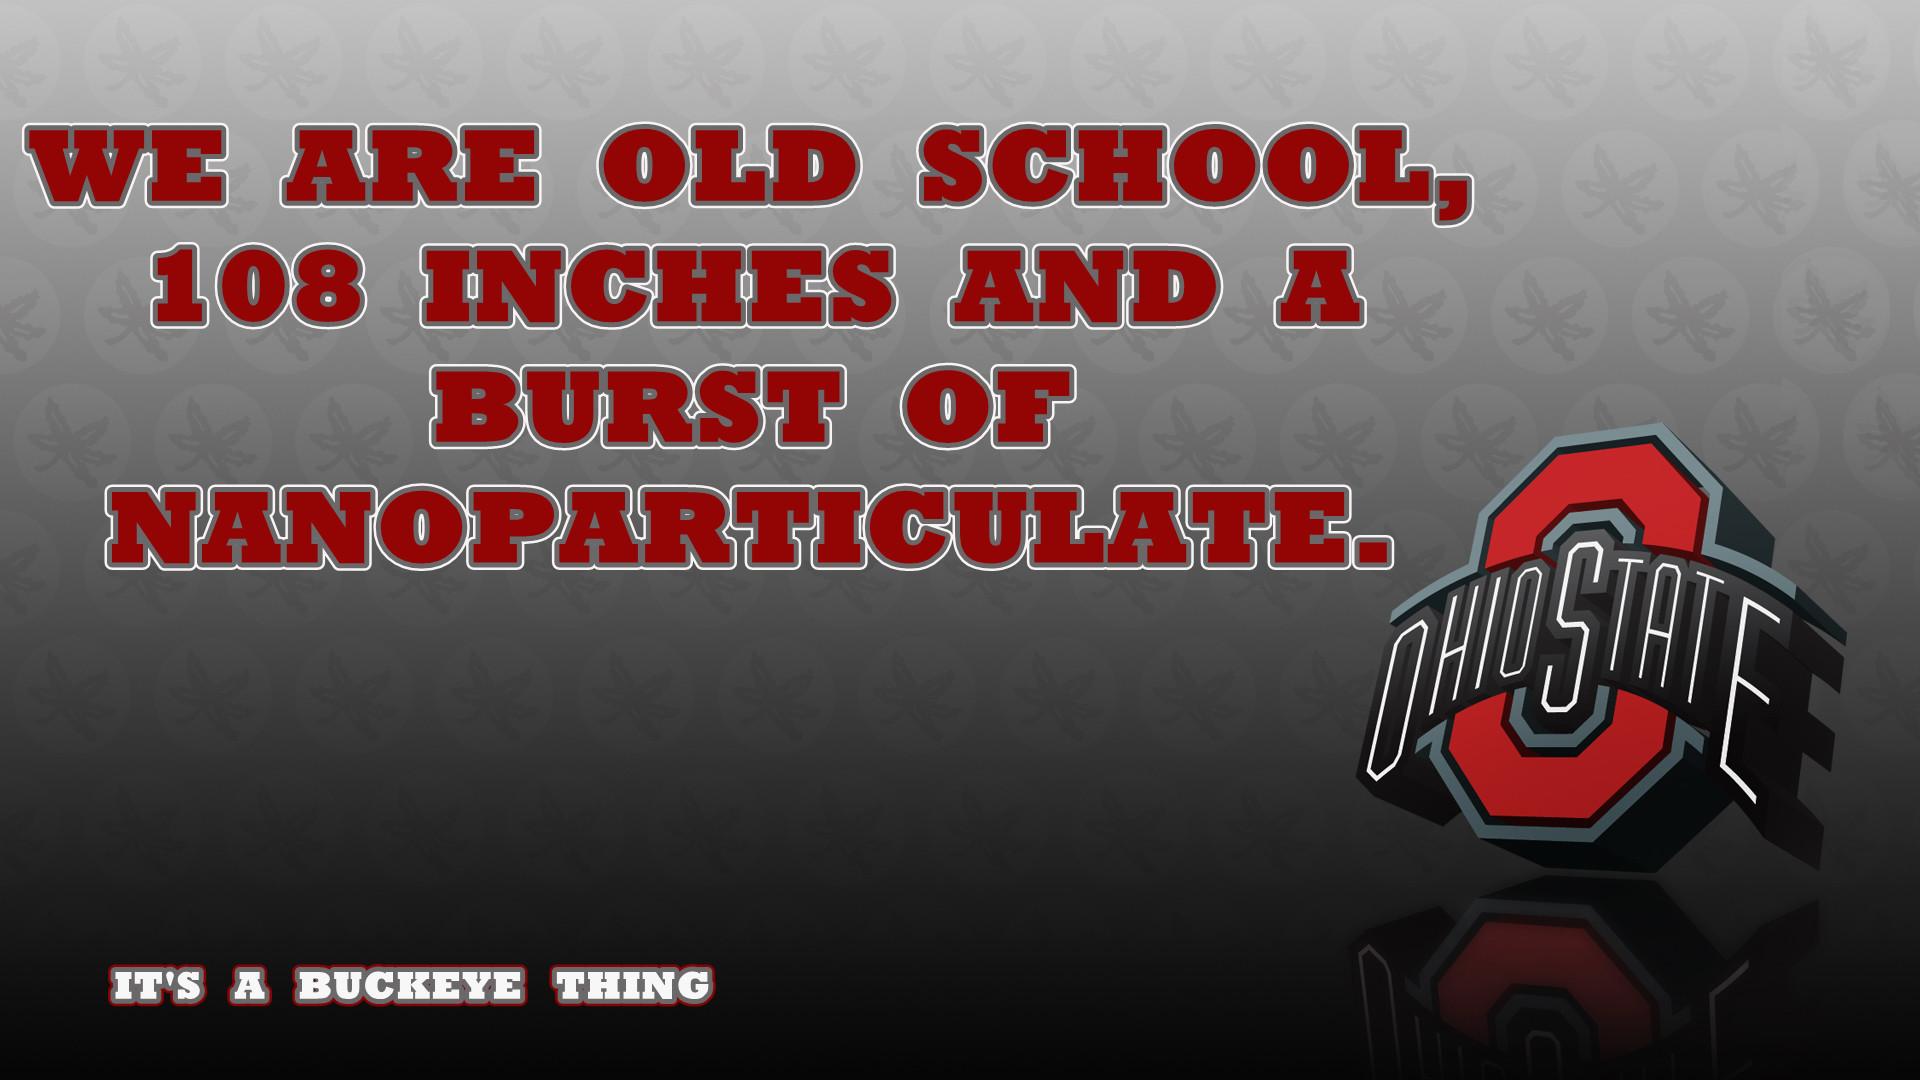 OHIO STATE BUCKEYES college football (9) wallpaper | .